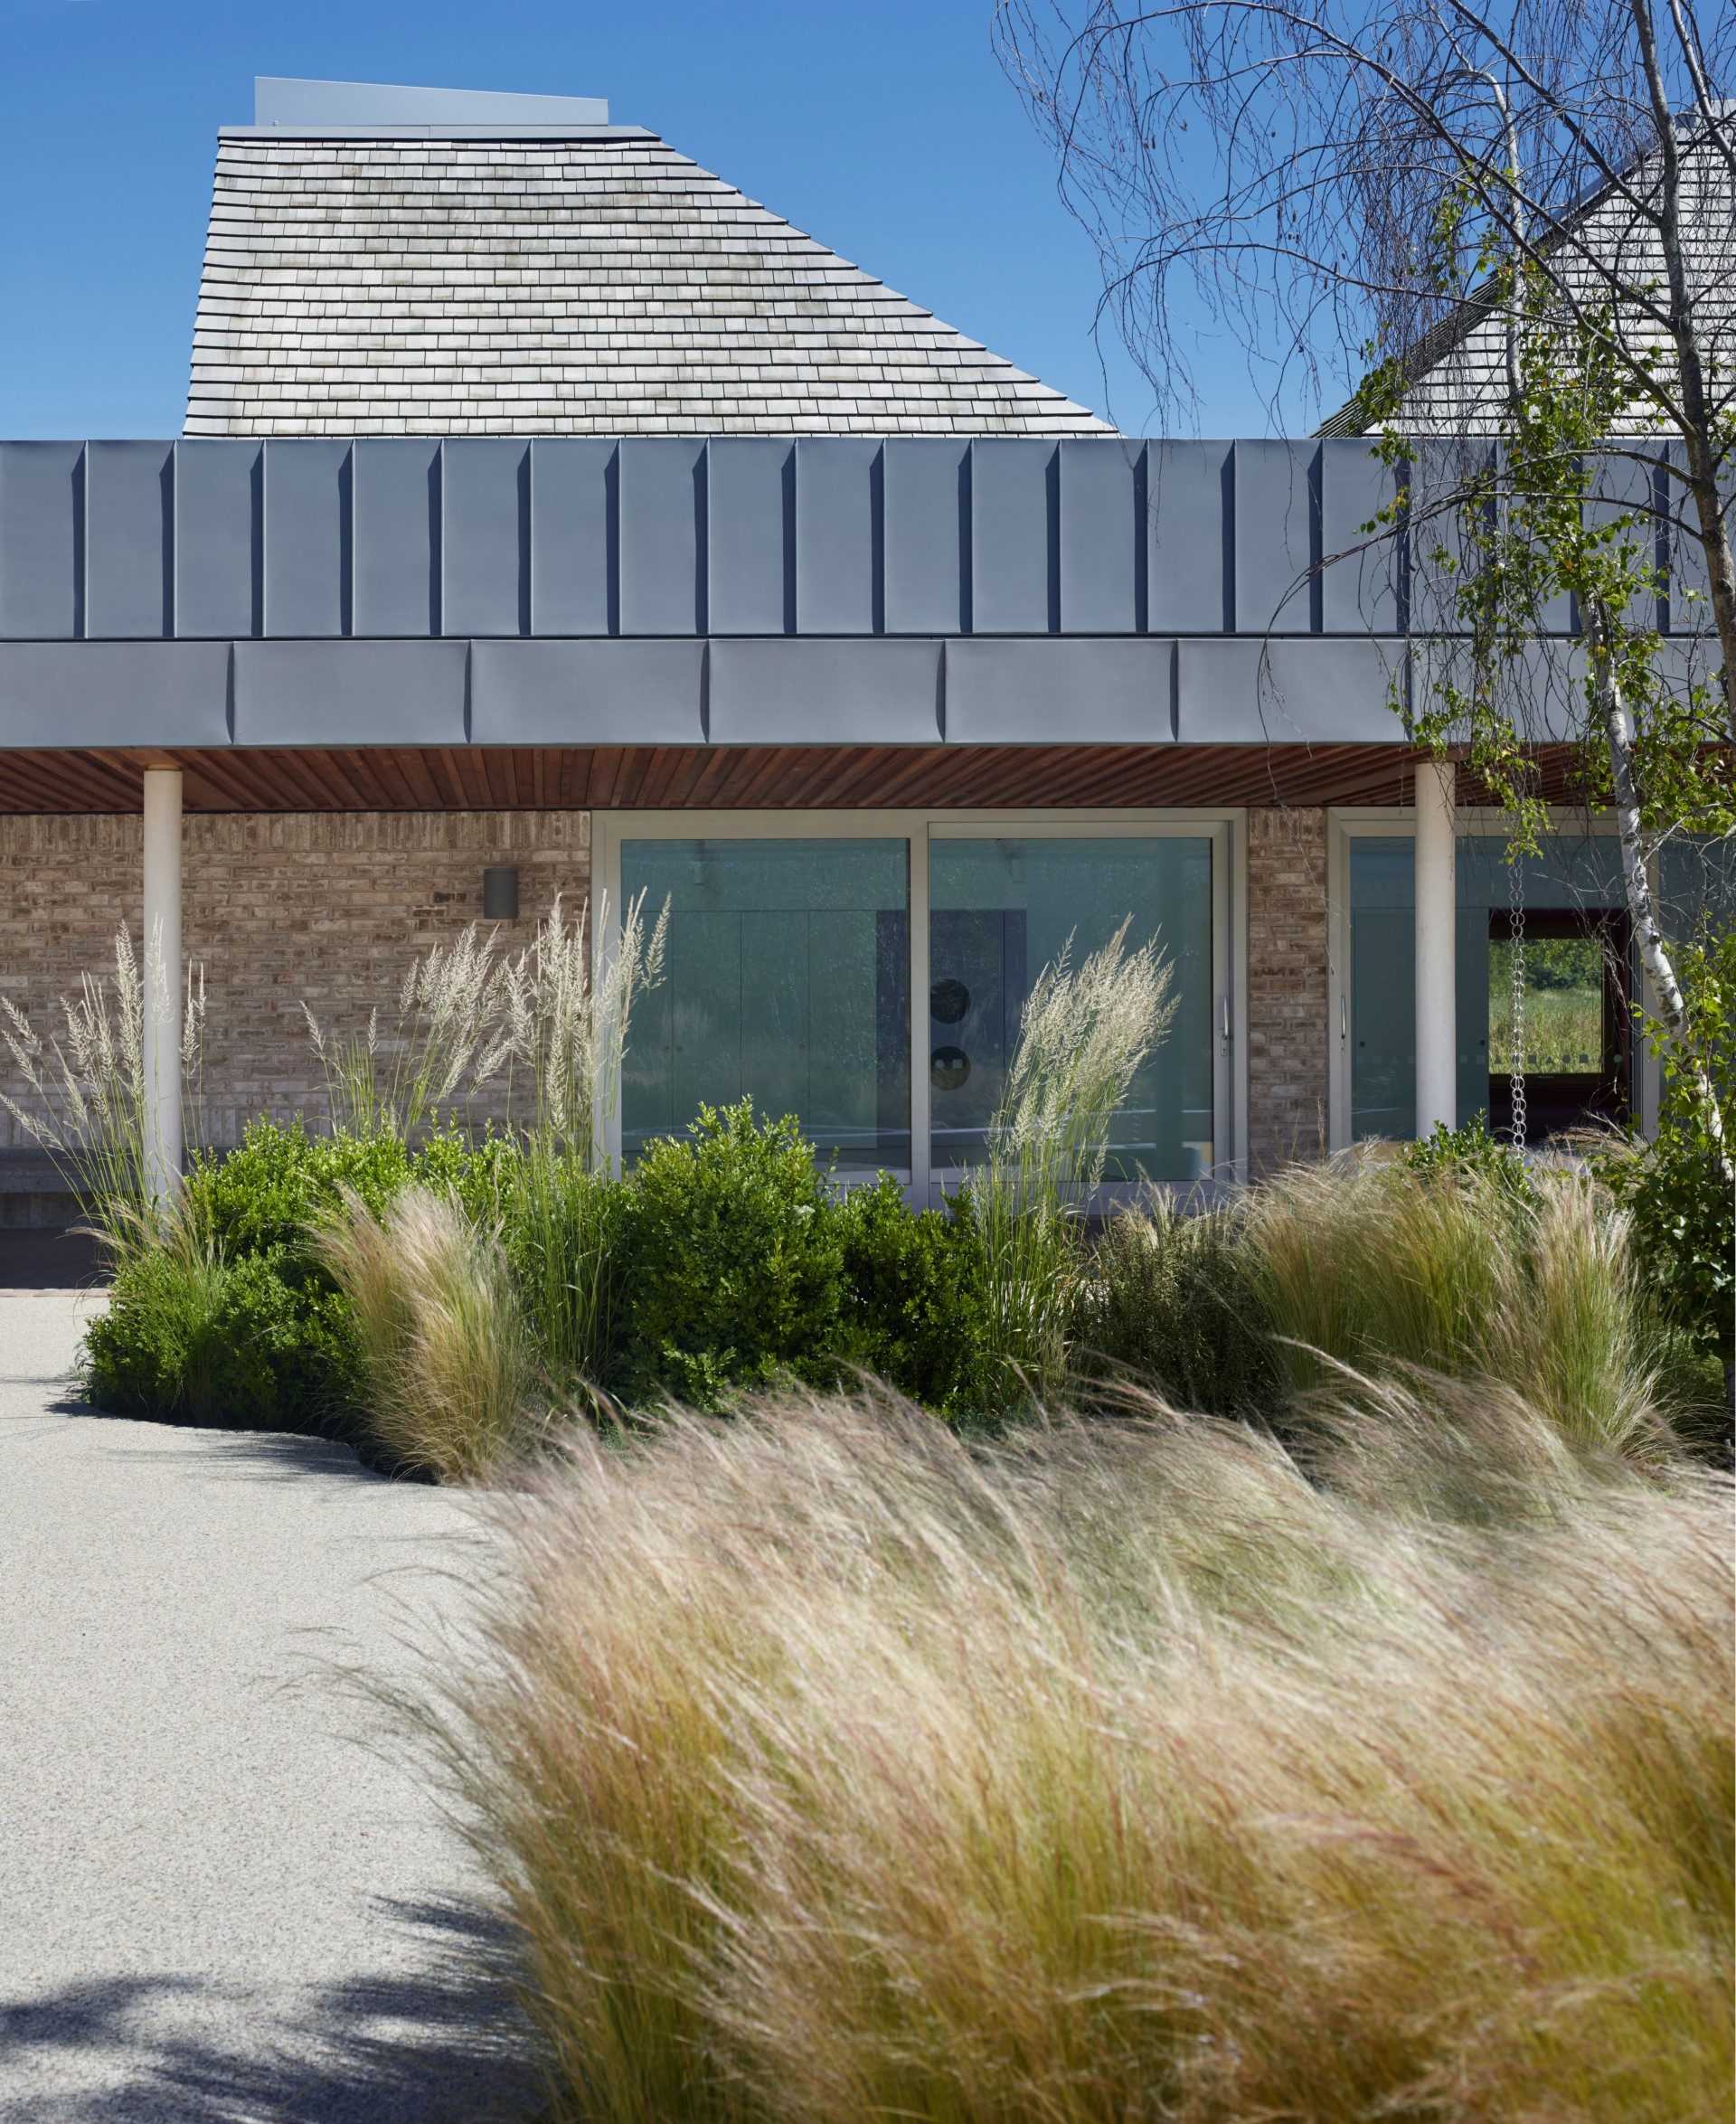 Storey's Field Community Centre and Nursery, MUMA, Cambridge